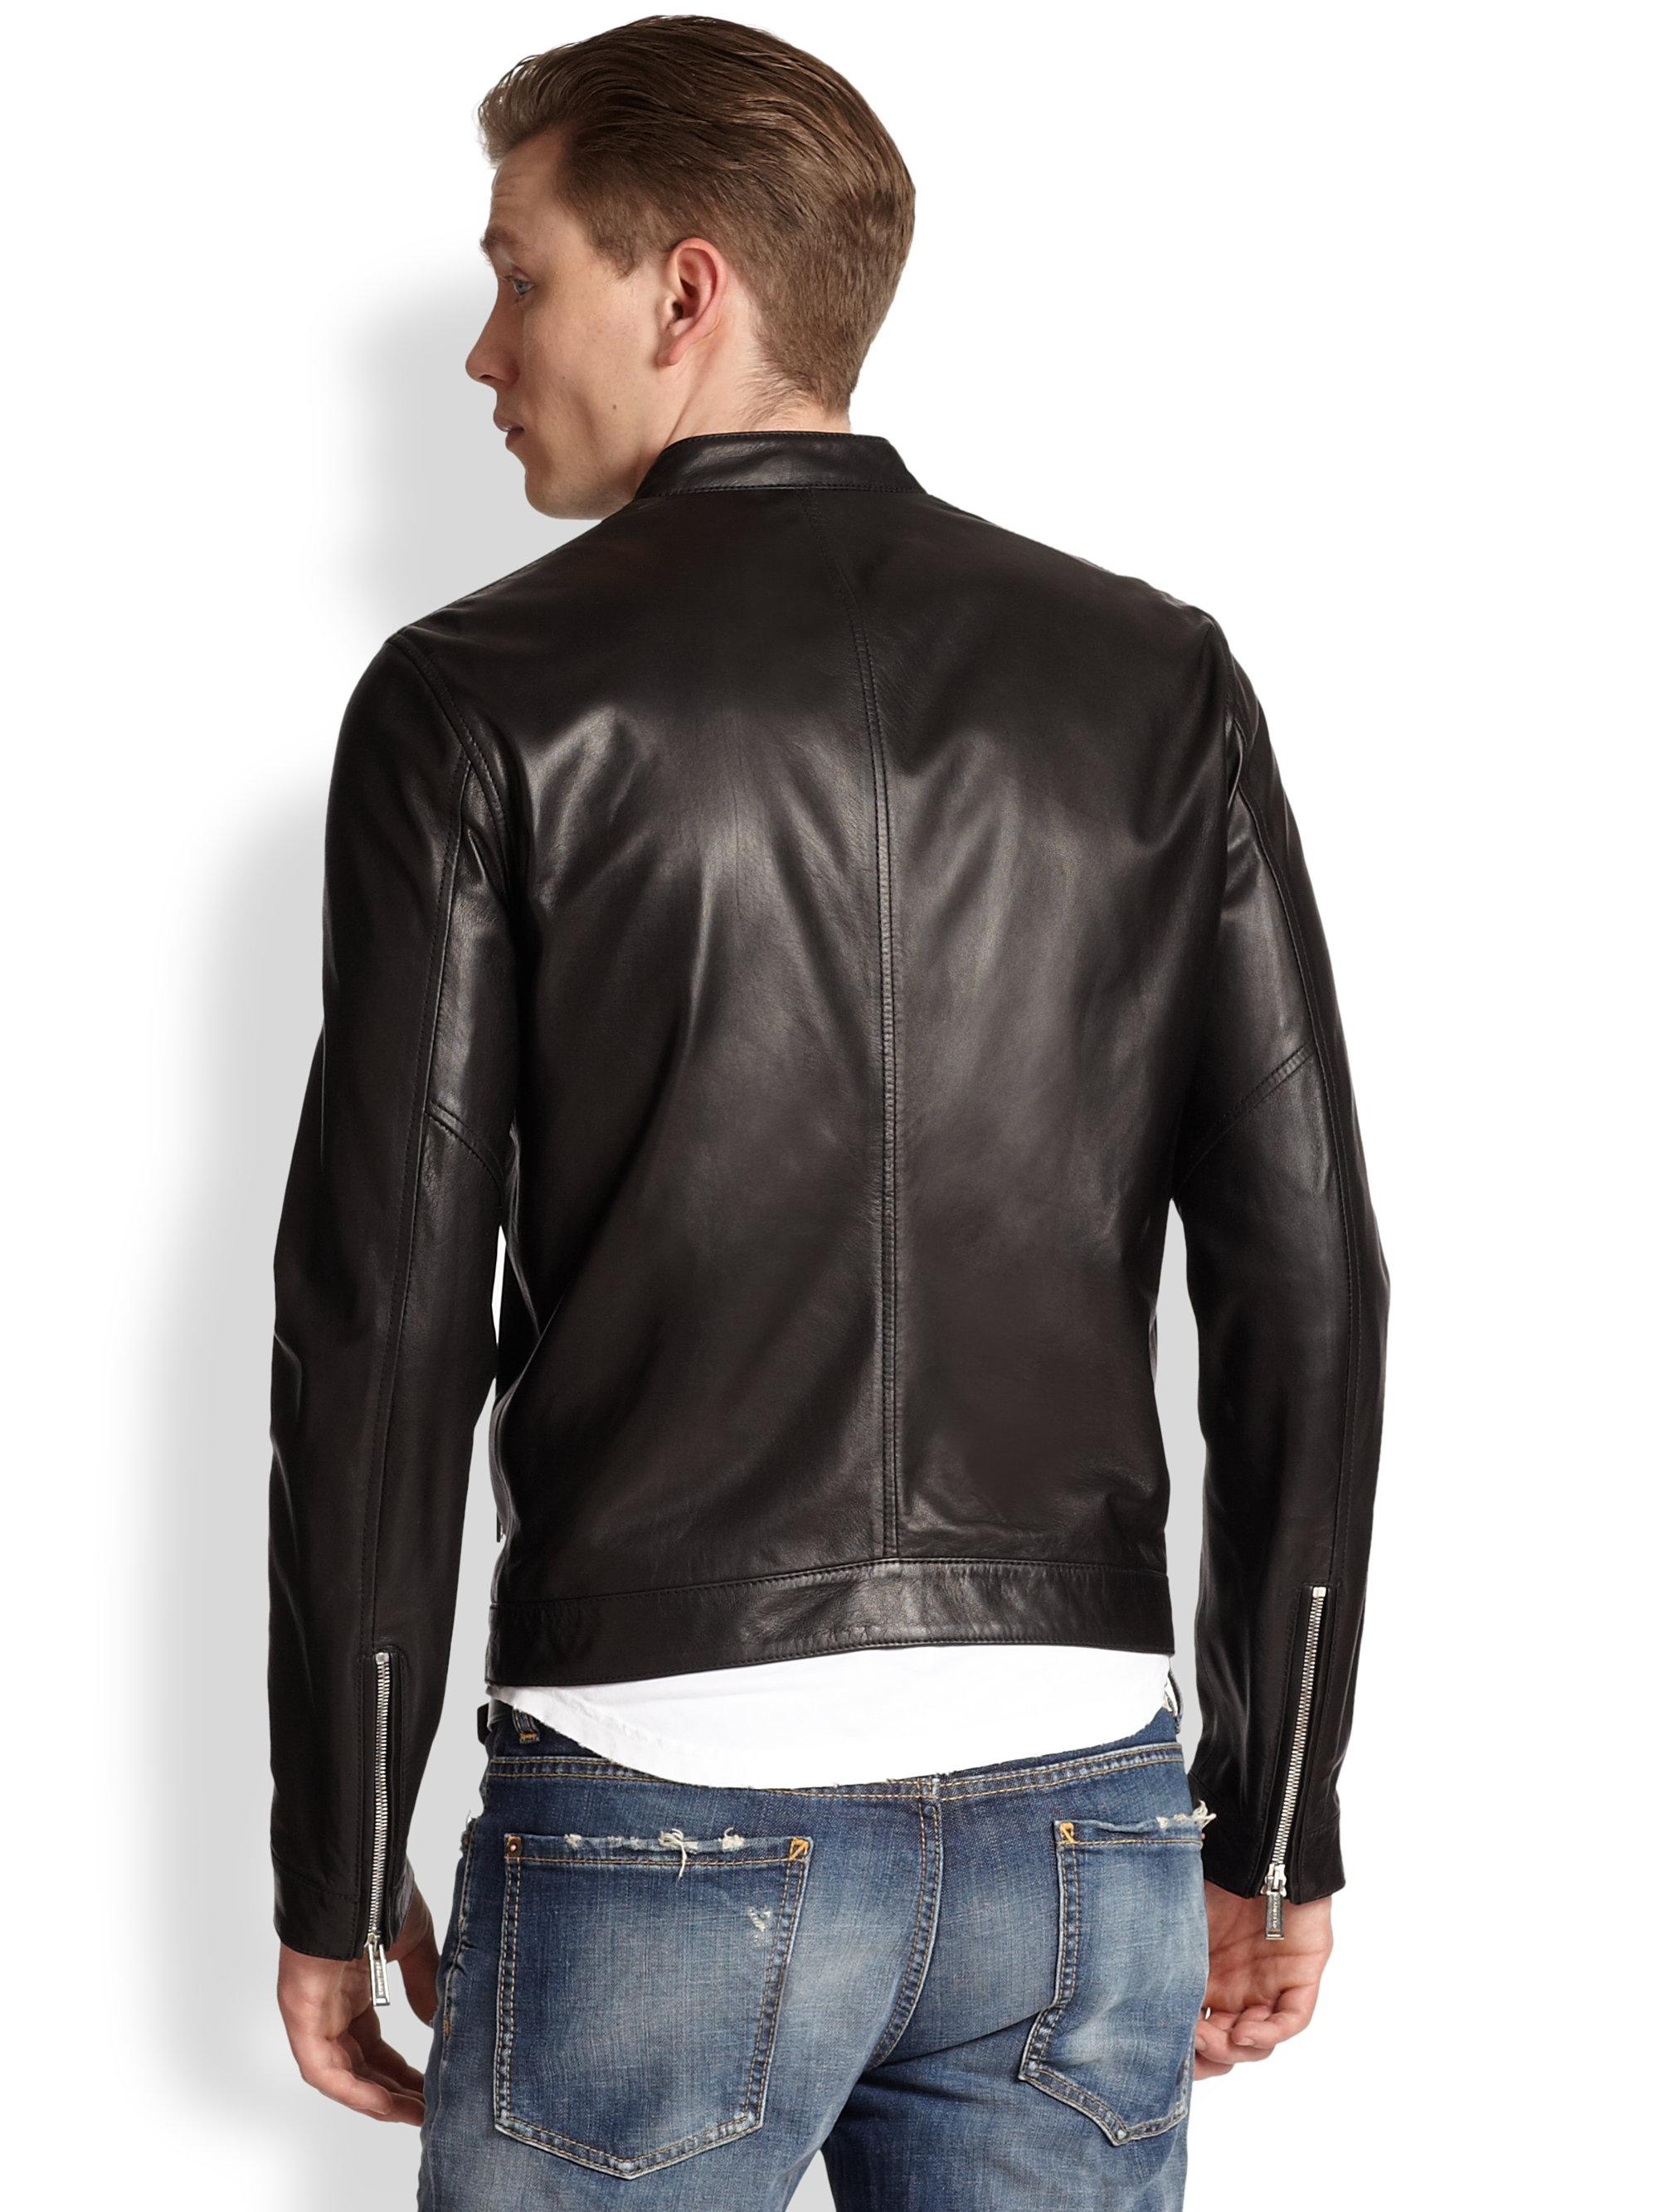 Dsquared² Lambskin Leather Jacket in Black for Men | Lyst